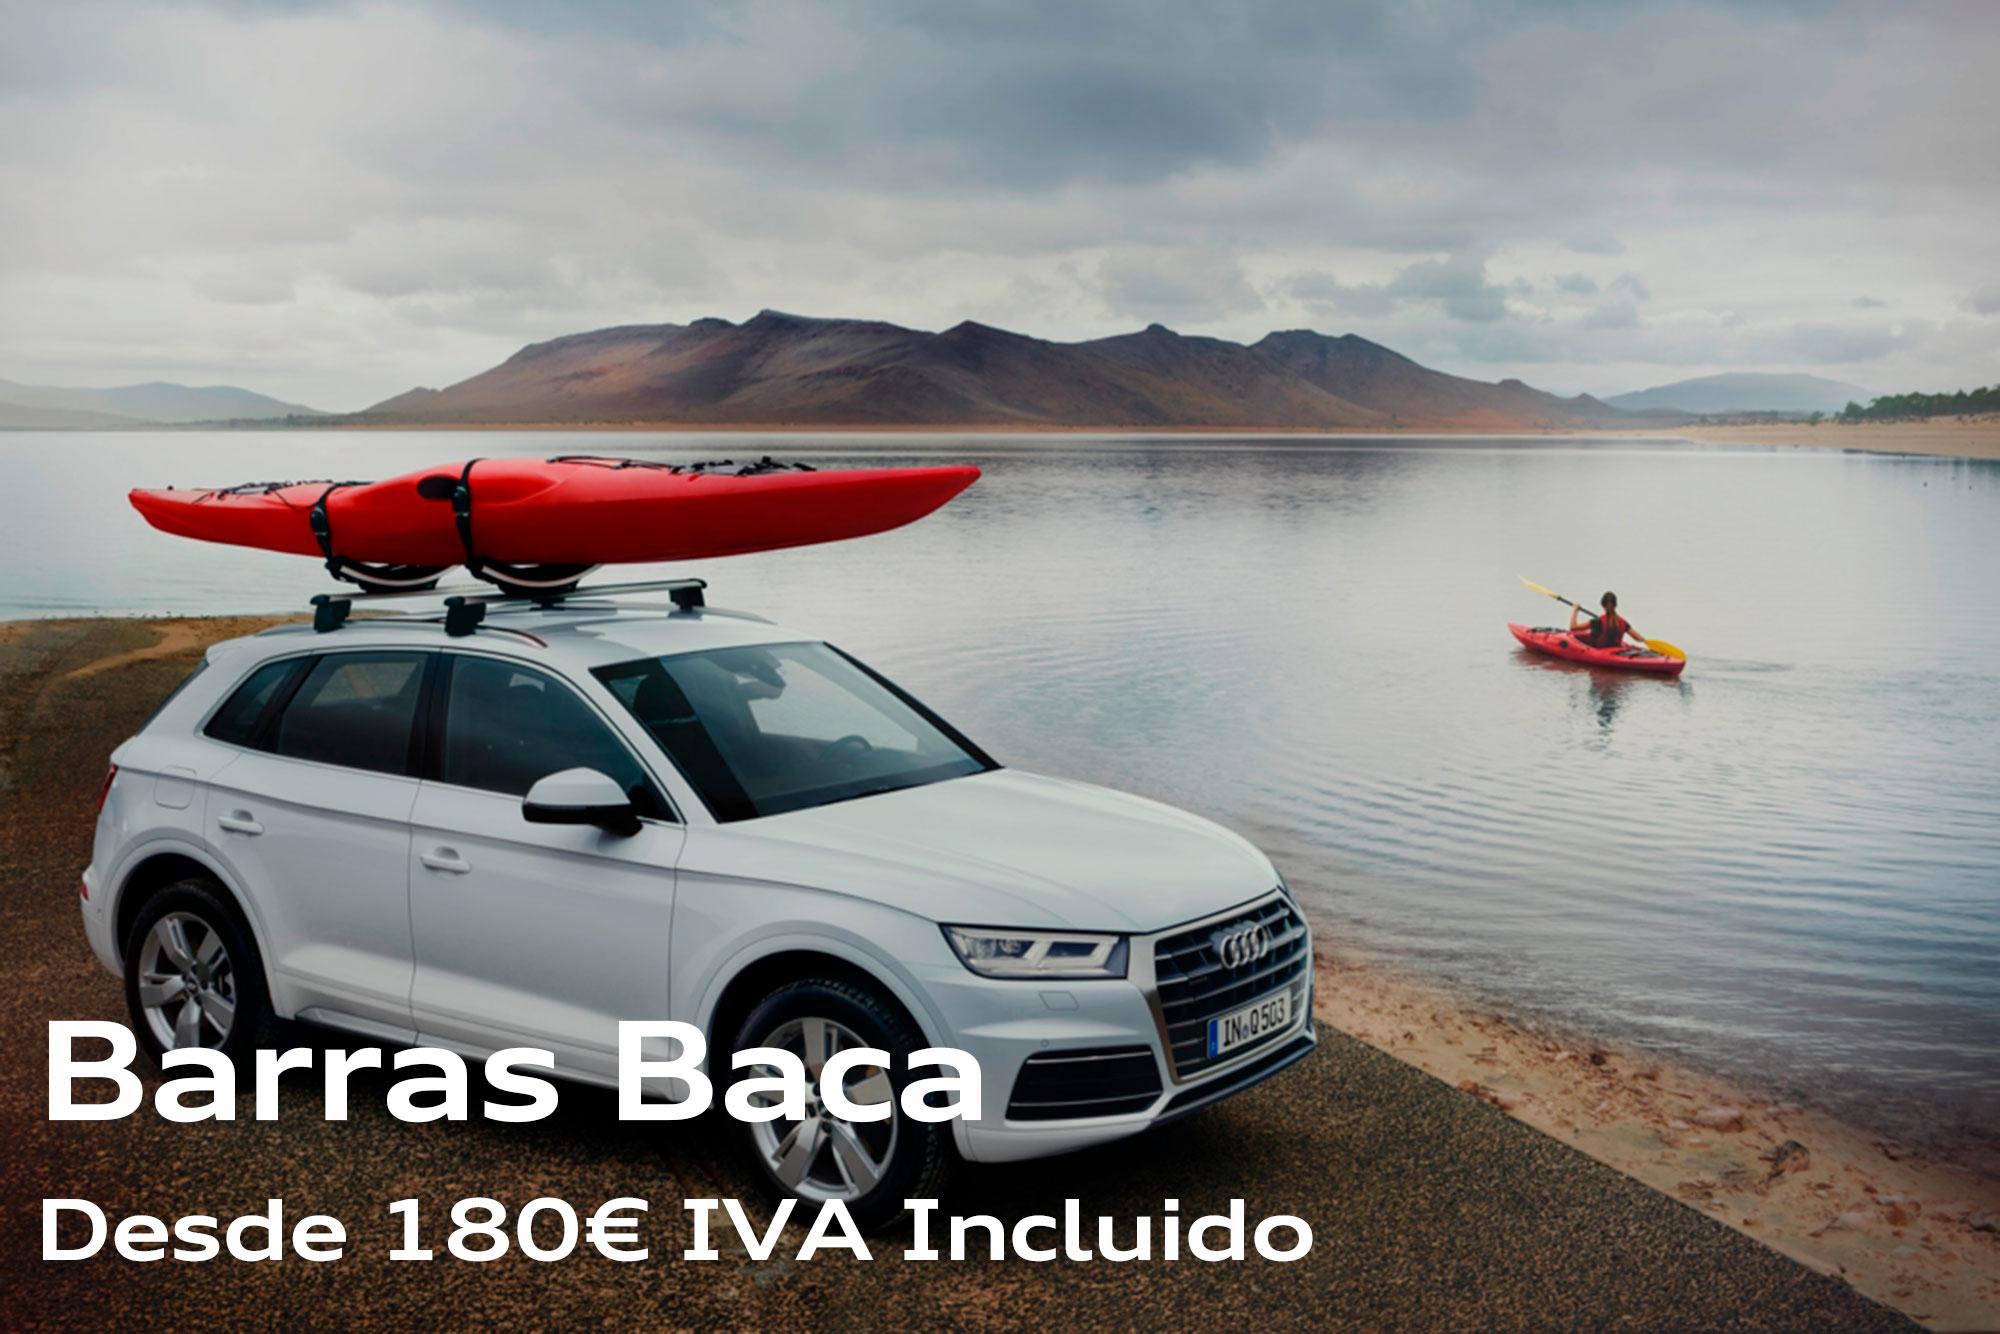 Barras-Baca